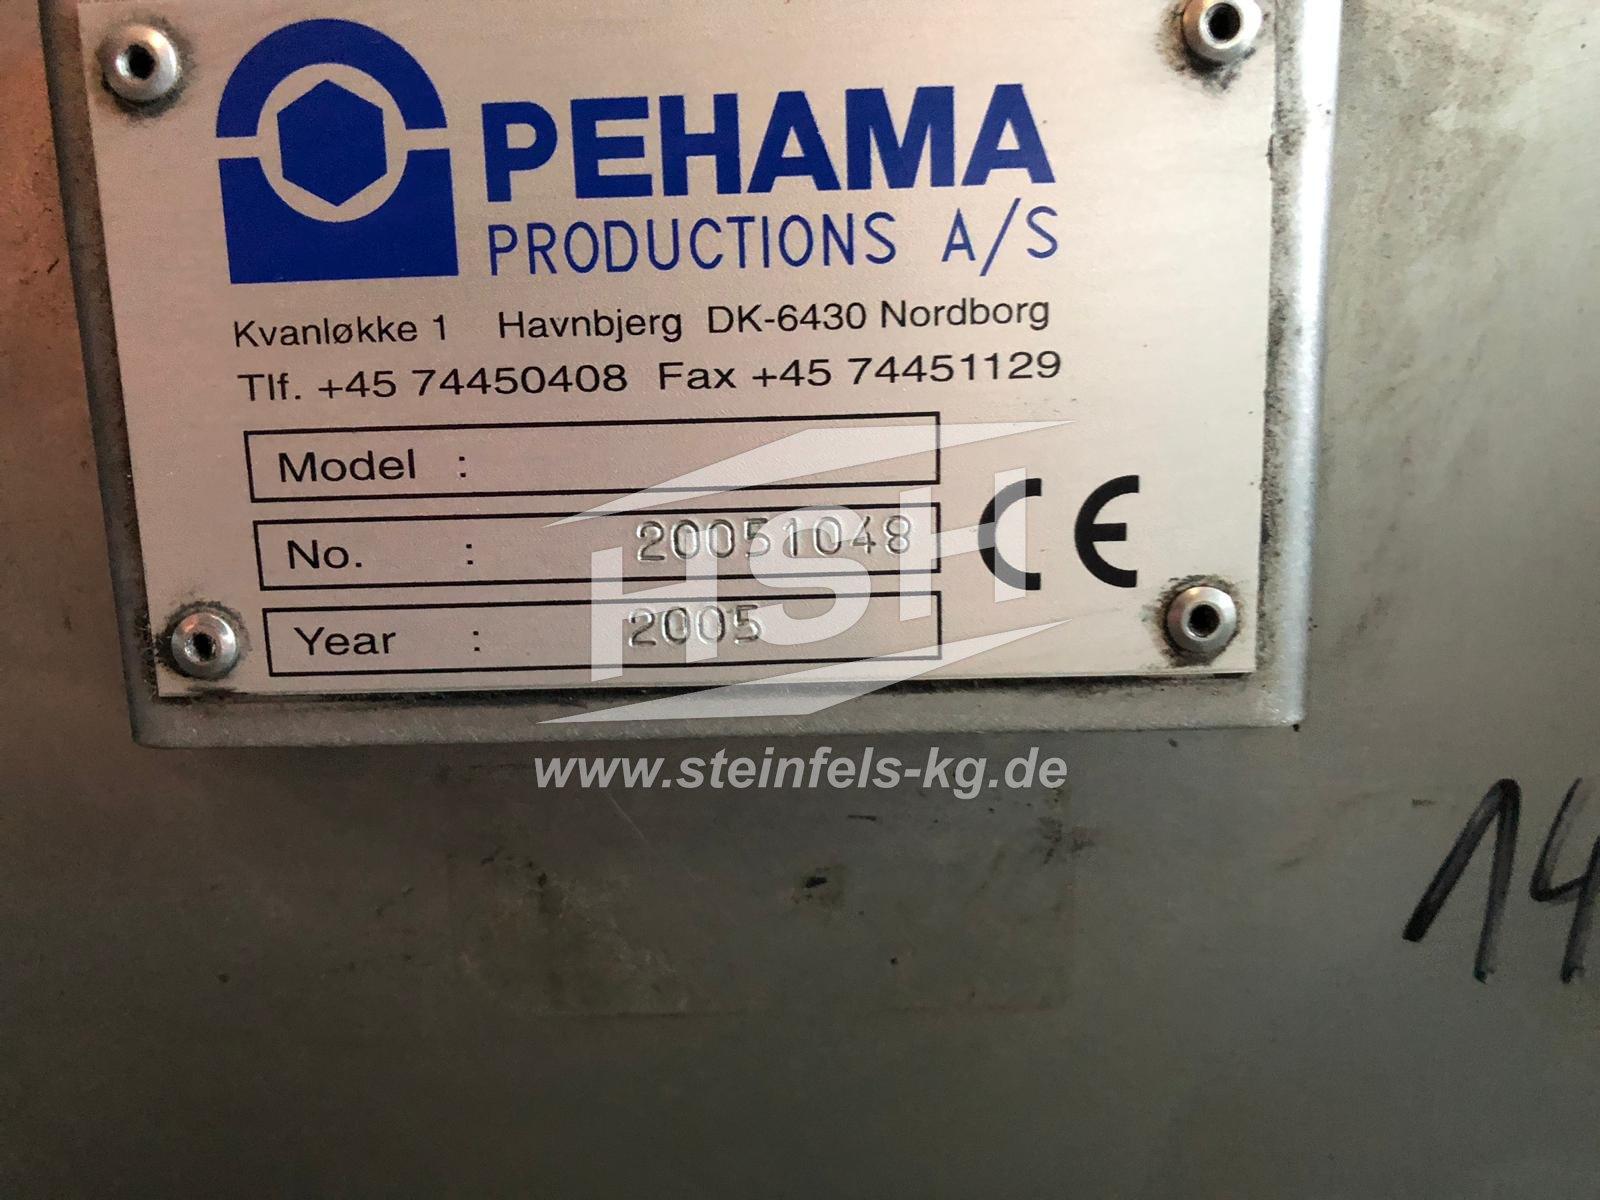 D02L/7772 – PEHAMA – Magnetic-CE – 2005 – 150 mm